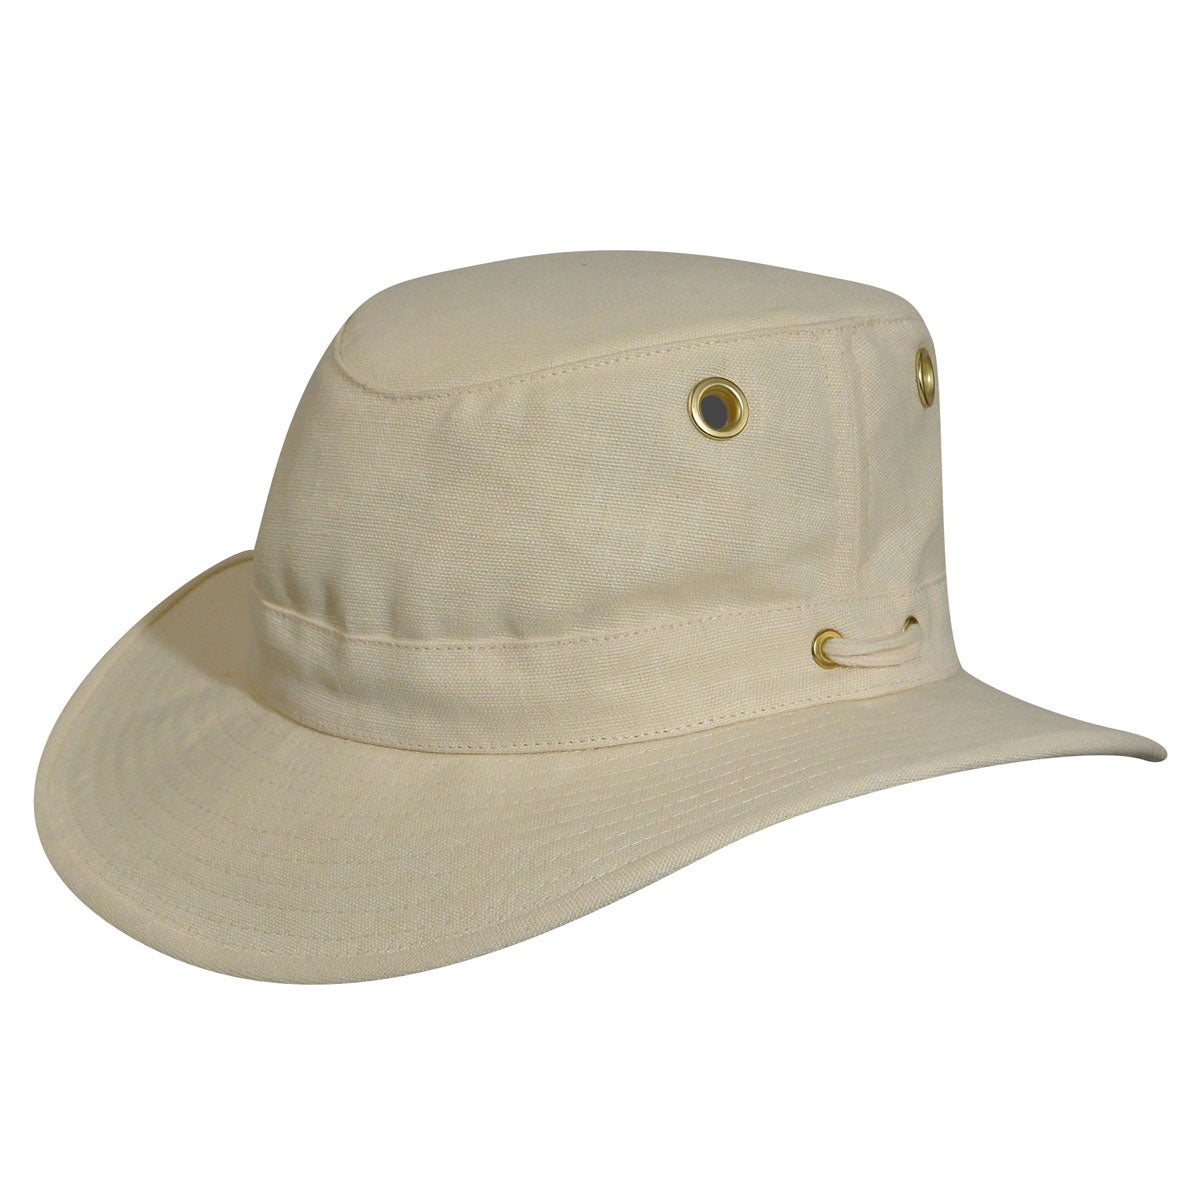 Tilley Medium Brim Hemp Outback Hat in Natural